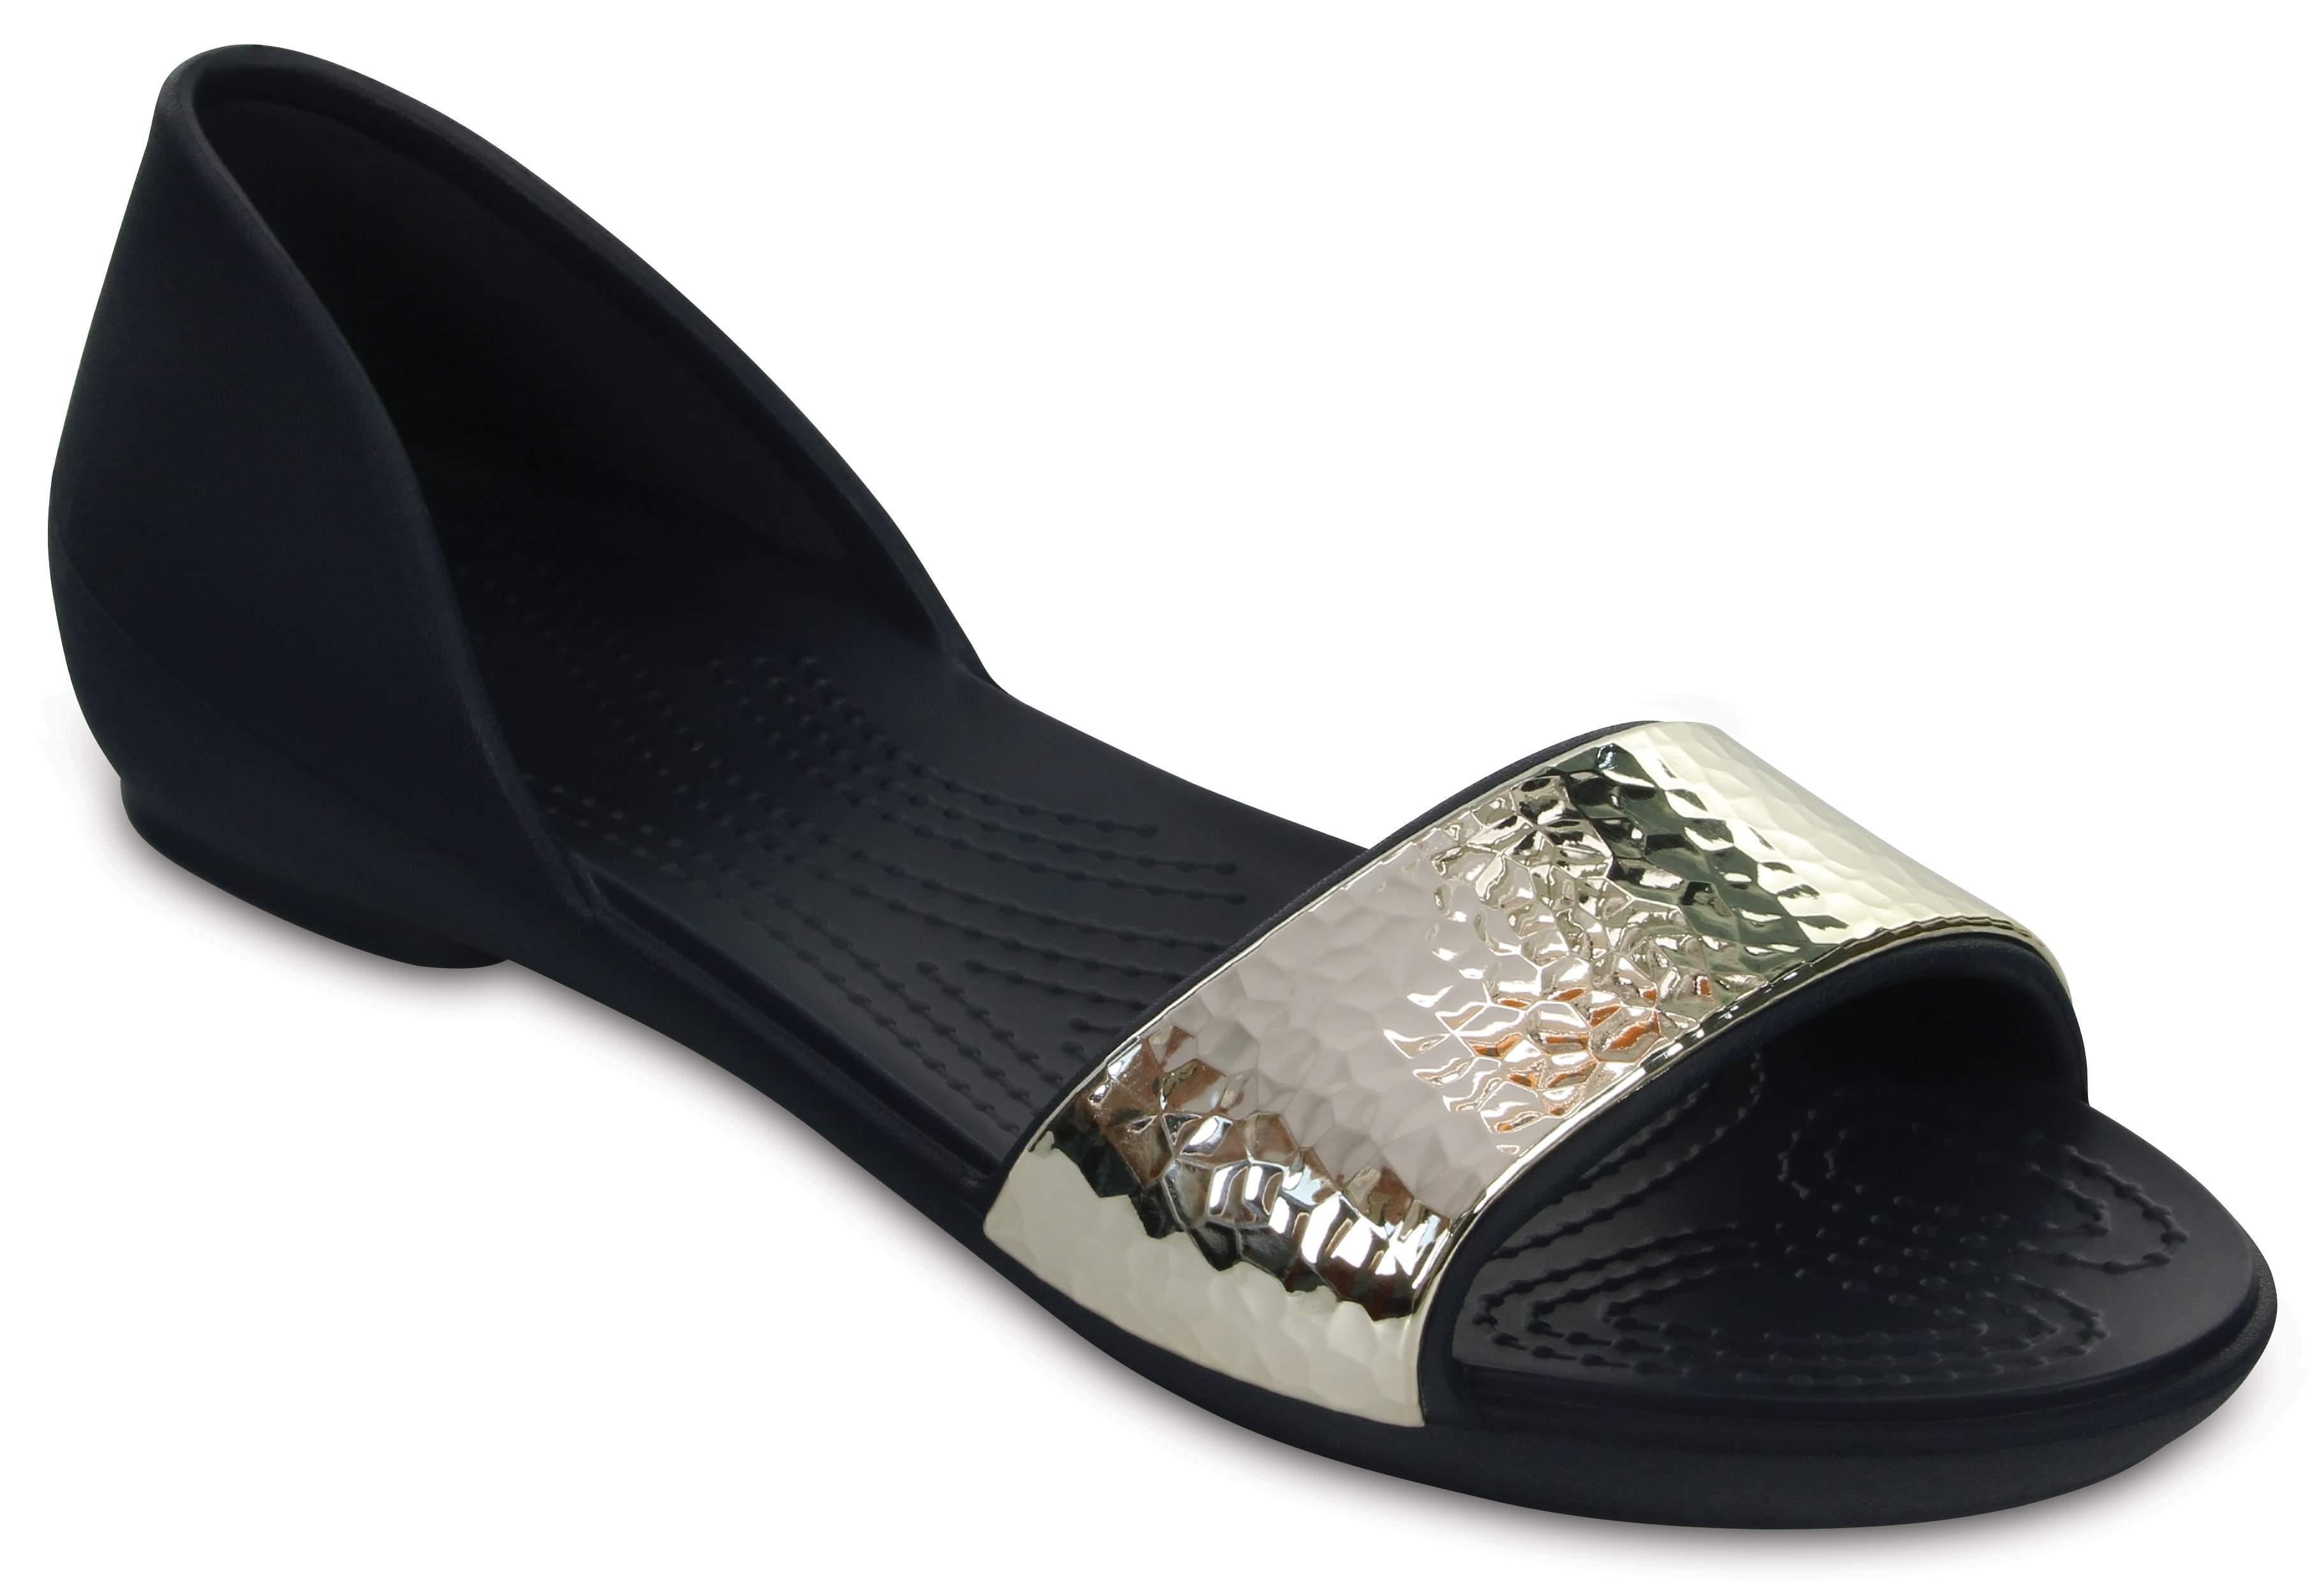 Womens Crocslina Embellish Dorsayflat Blk/MLTI Ballet Flats Crocs